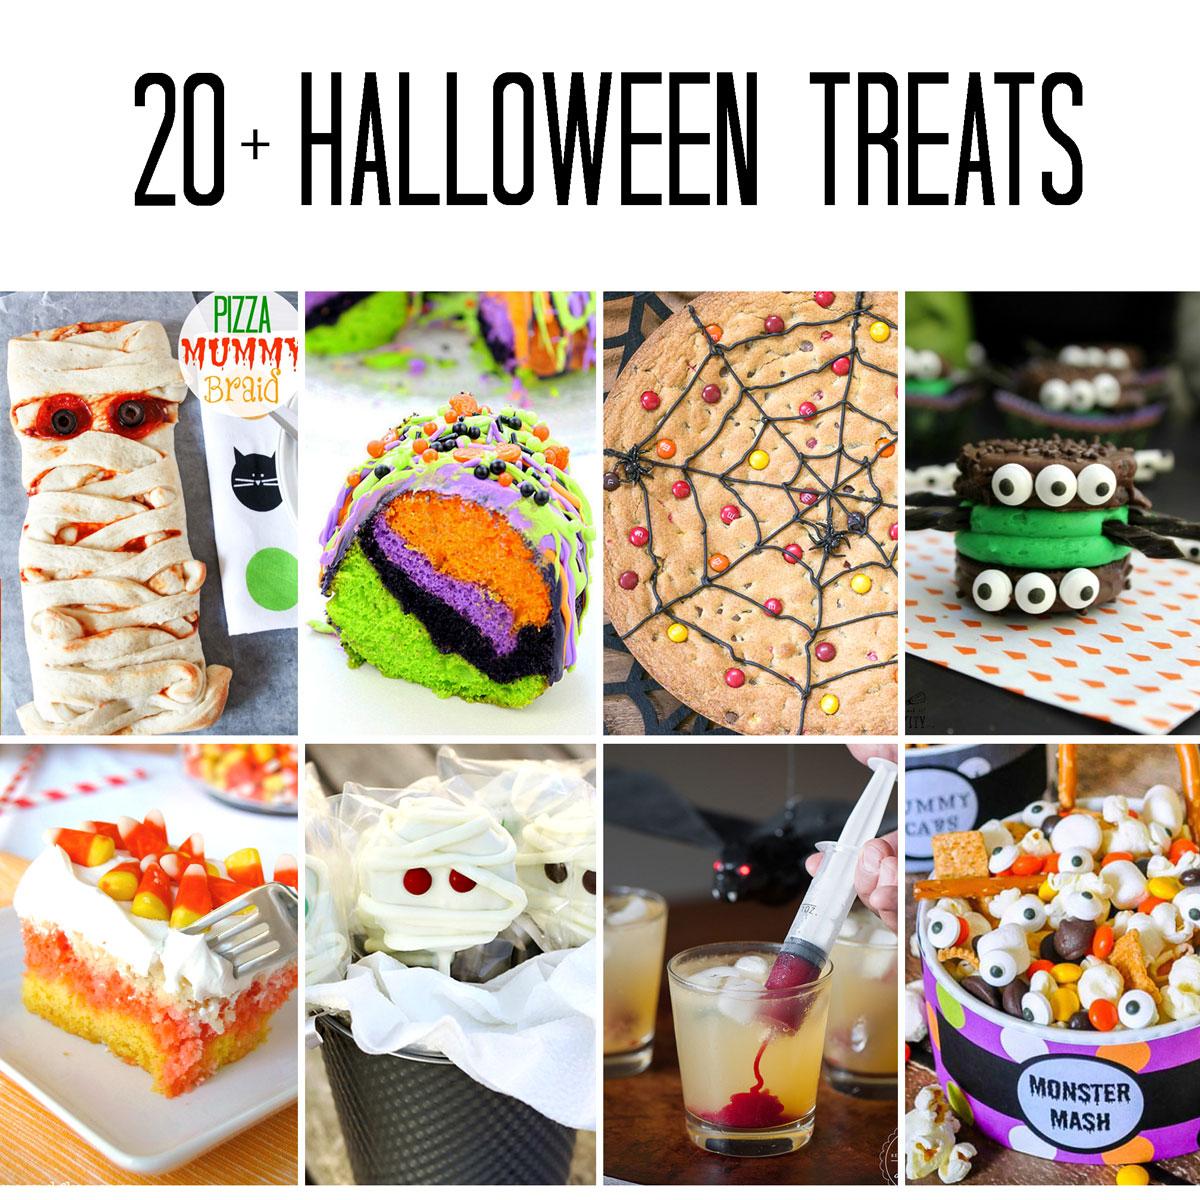 20+ Halloween Treats